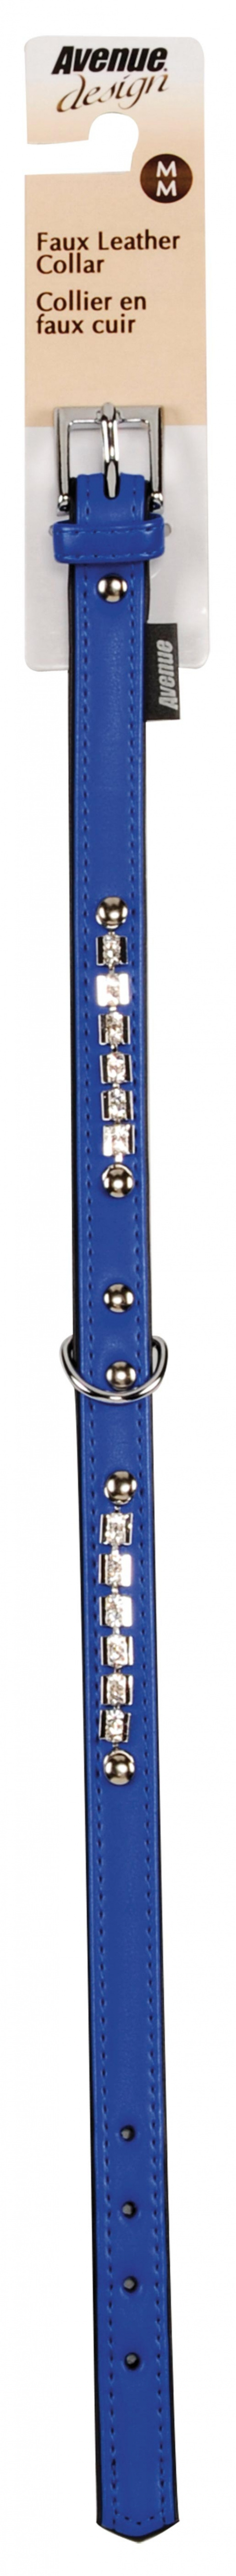 Obojek AVENUE Viva modrý M 42cm